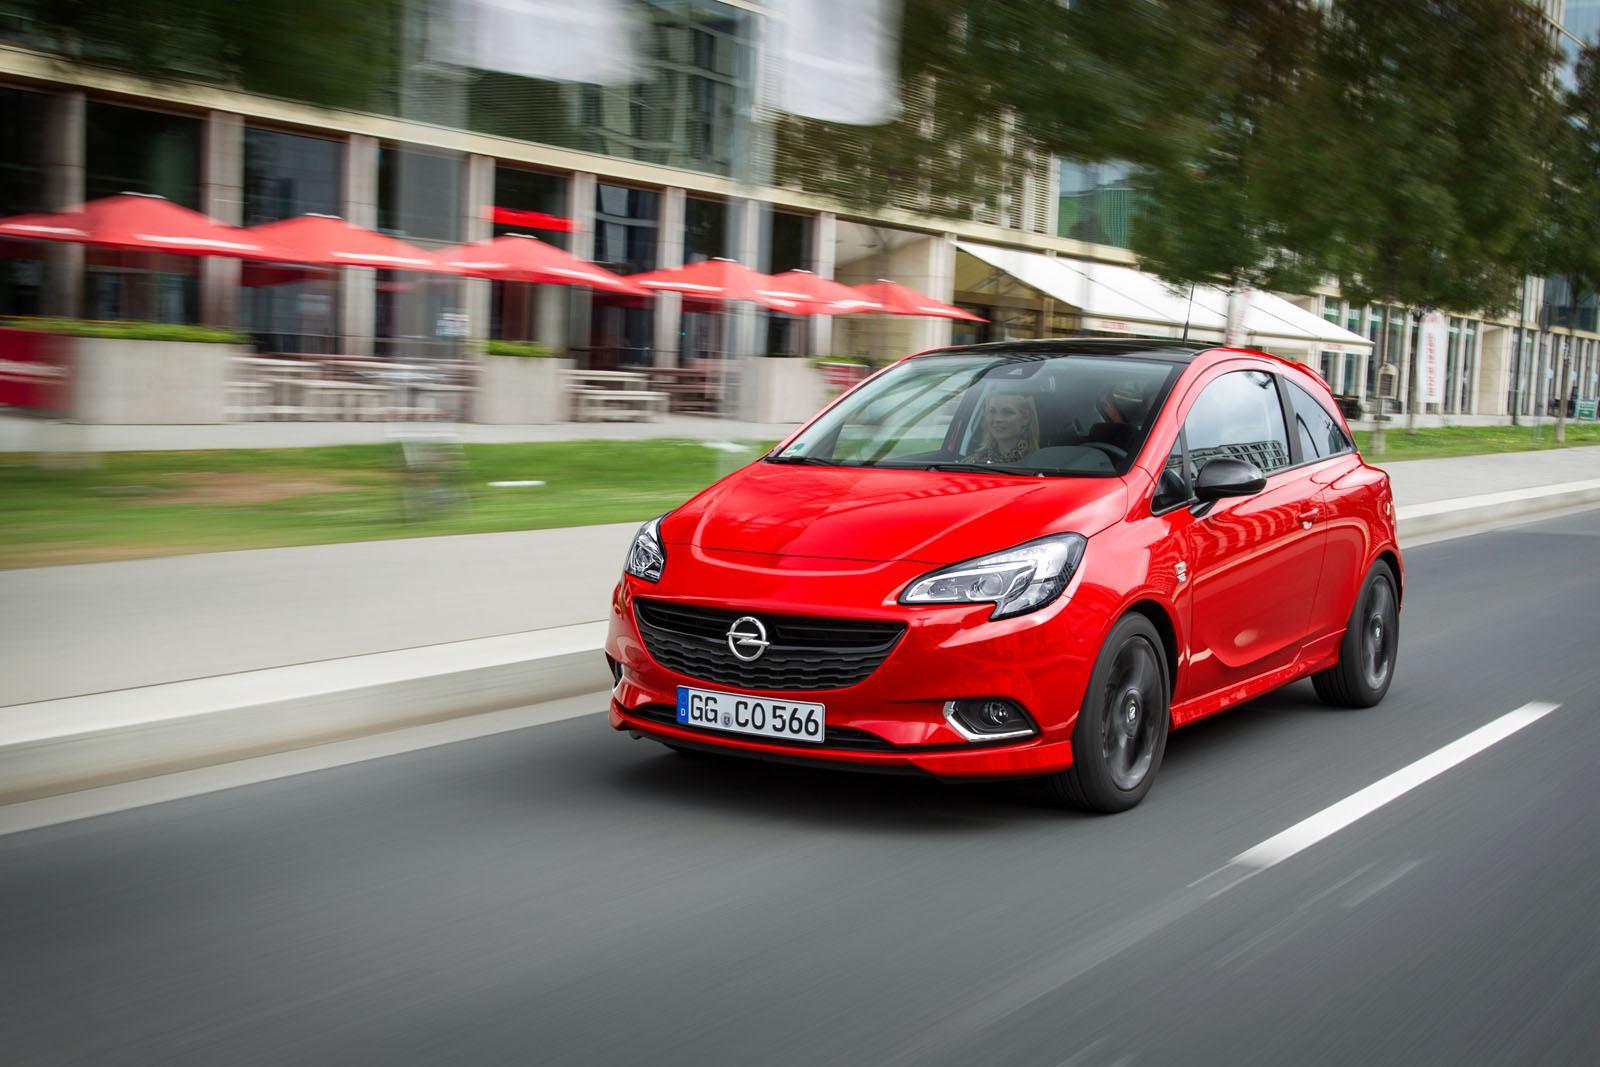 2015 Opel Corsa Receives Opc Line Treatment Autoevolution